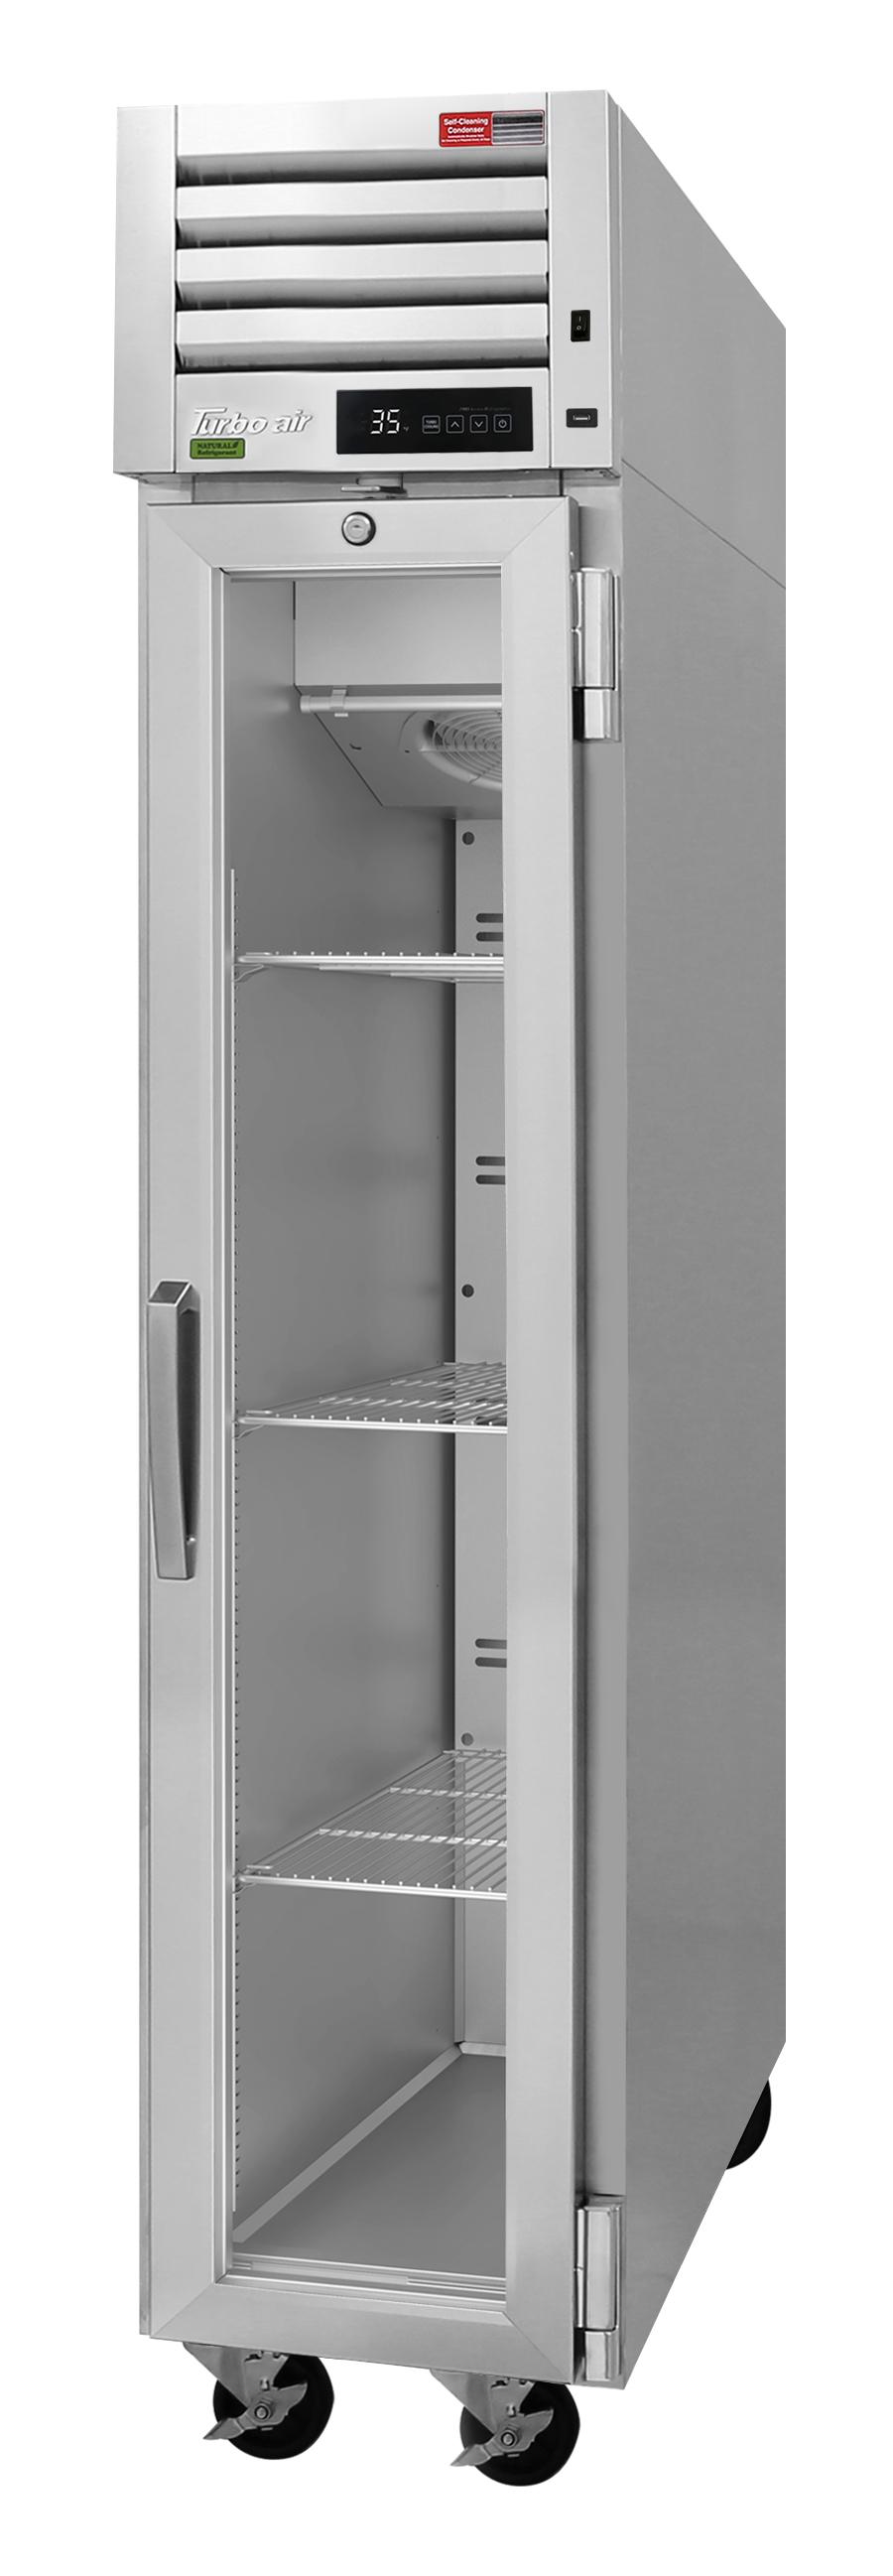 Turbo Air PRO-15-2R-G-N pro series - reach in refrigerator